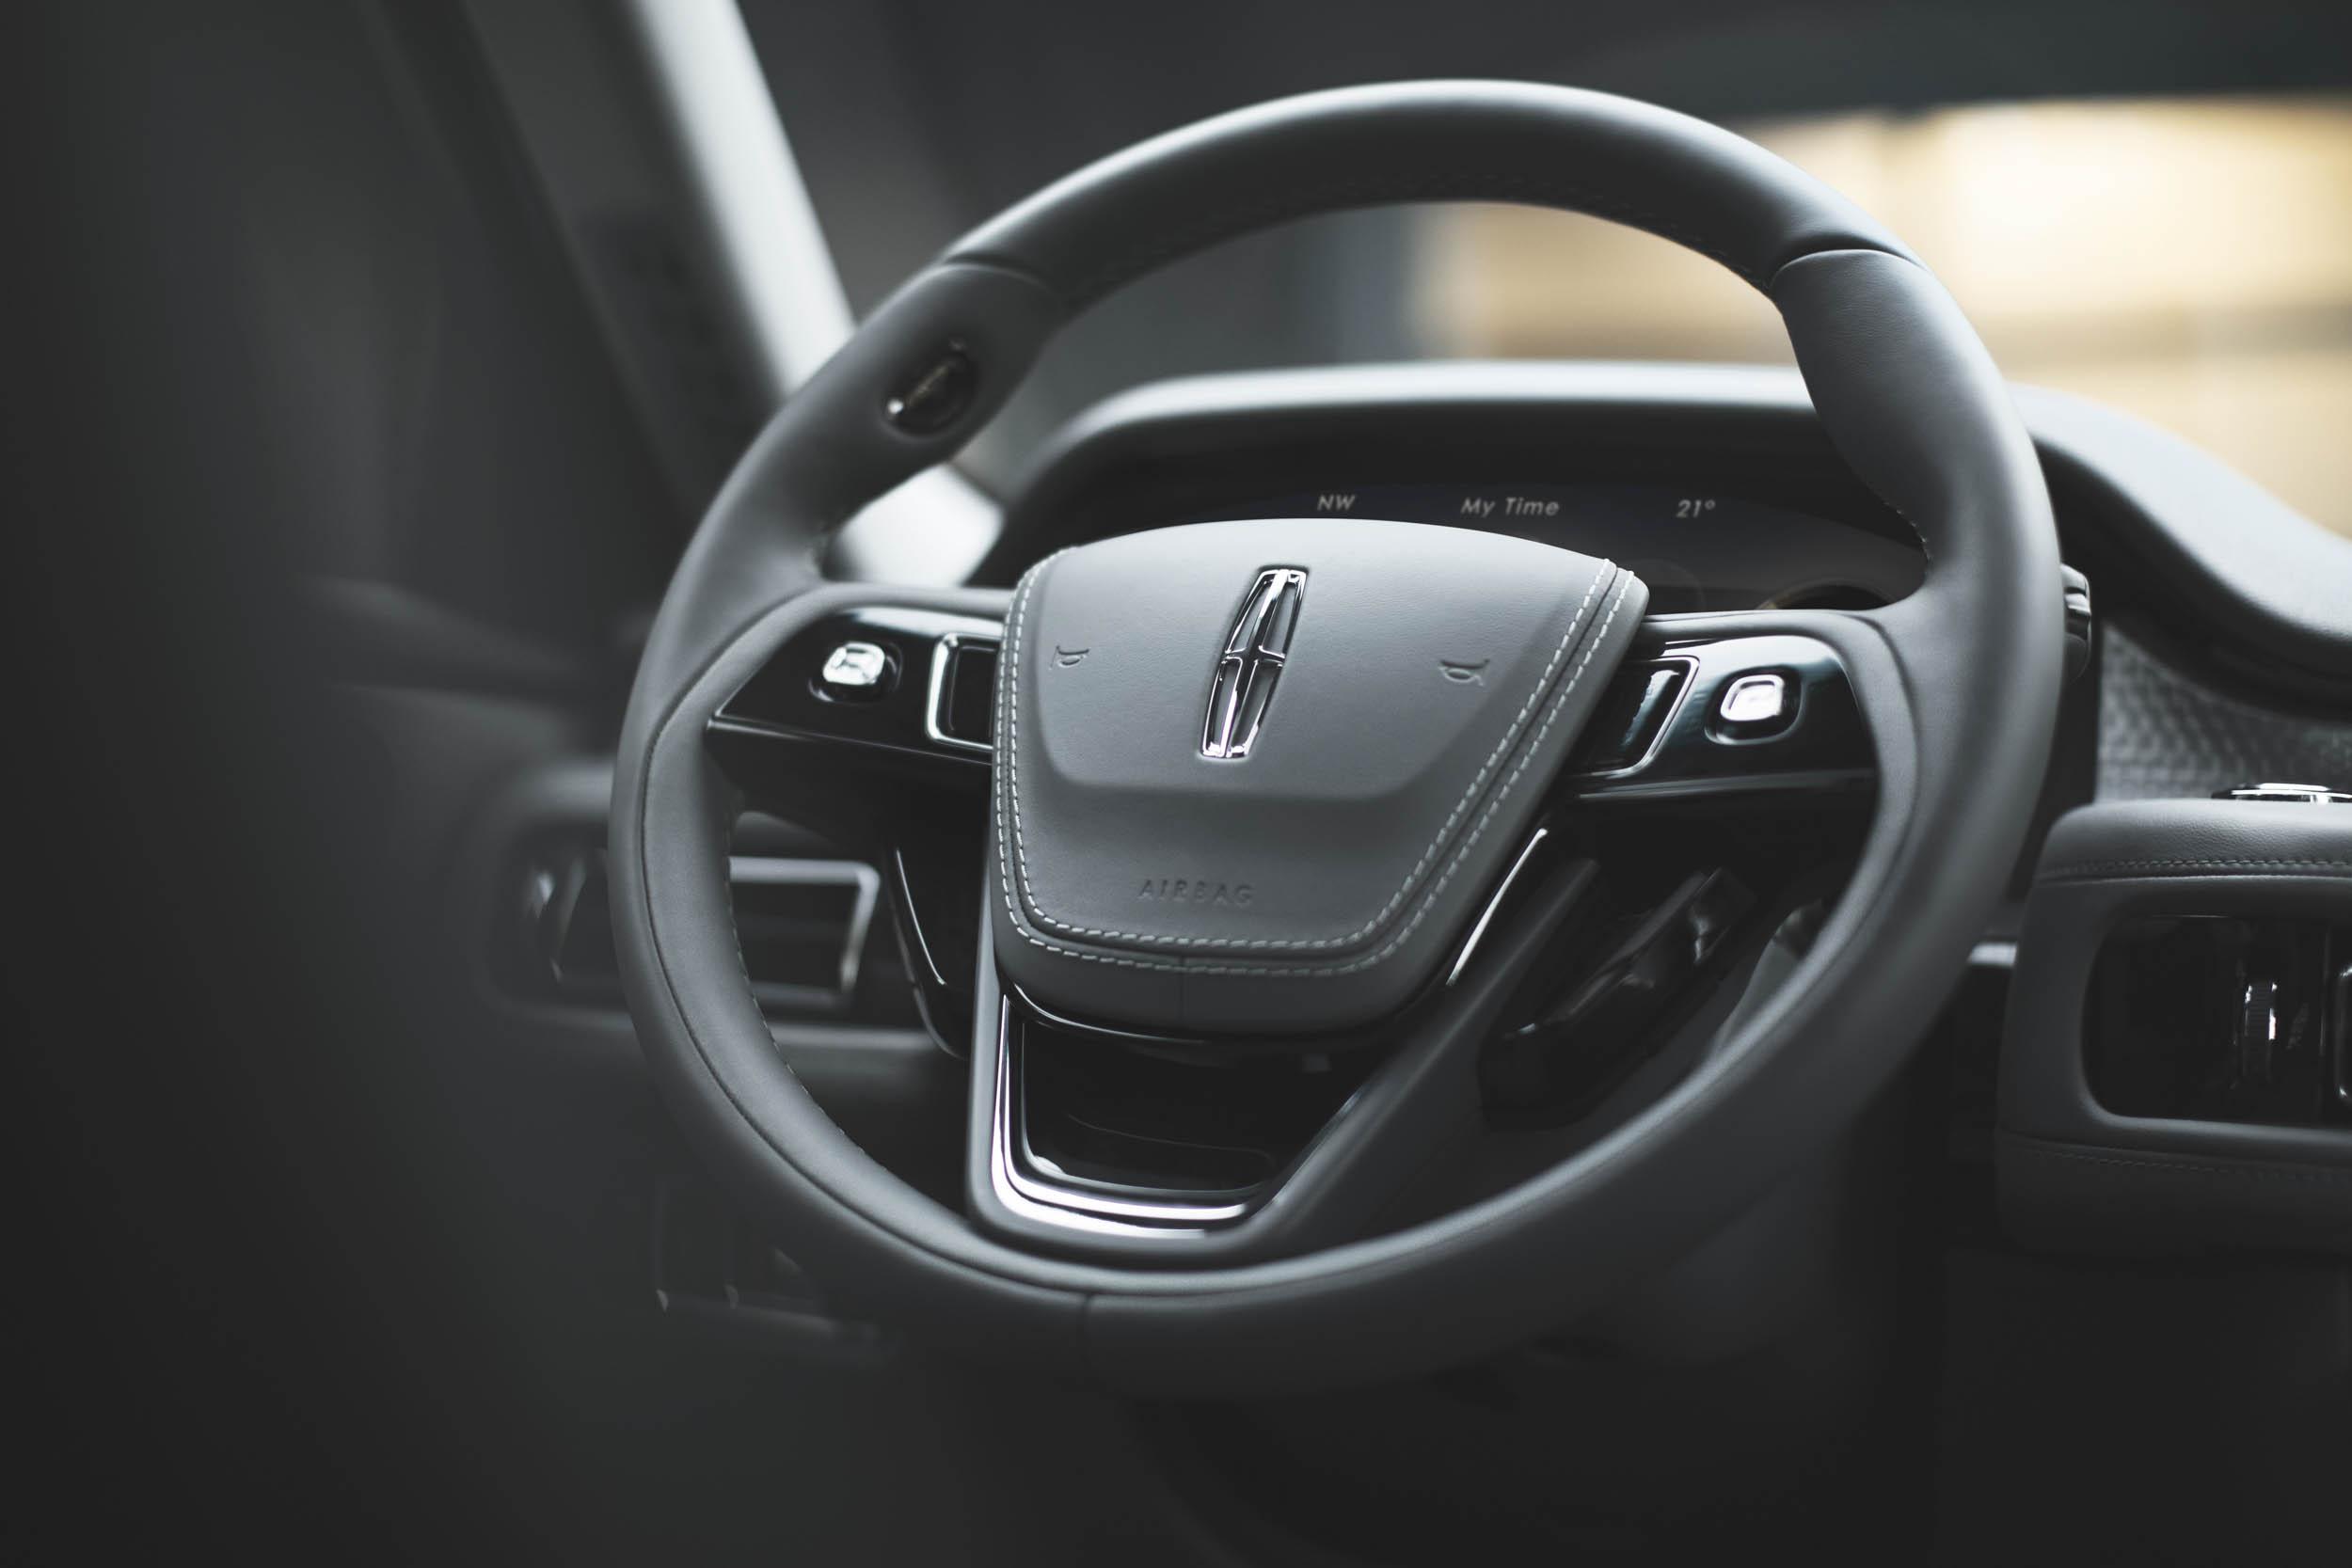 2020 Lincoln Aviator steering wheel